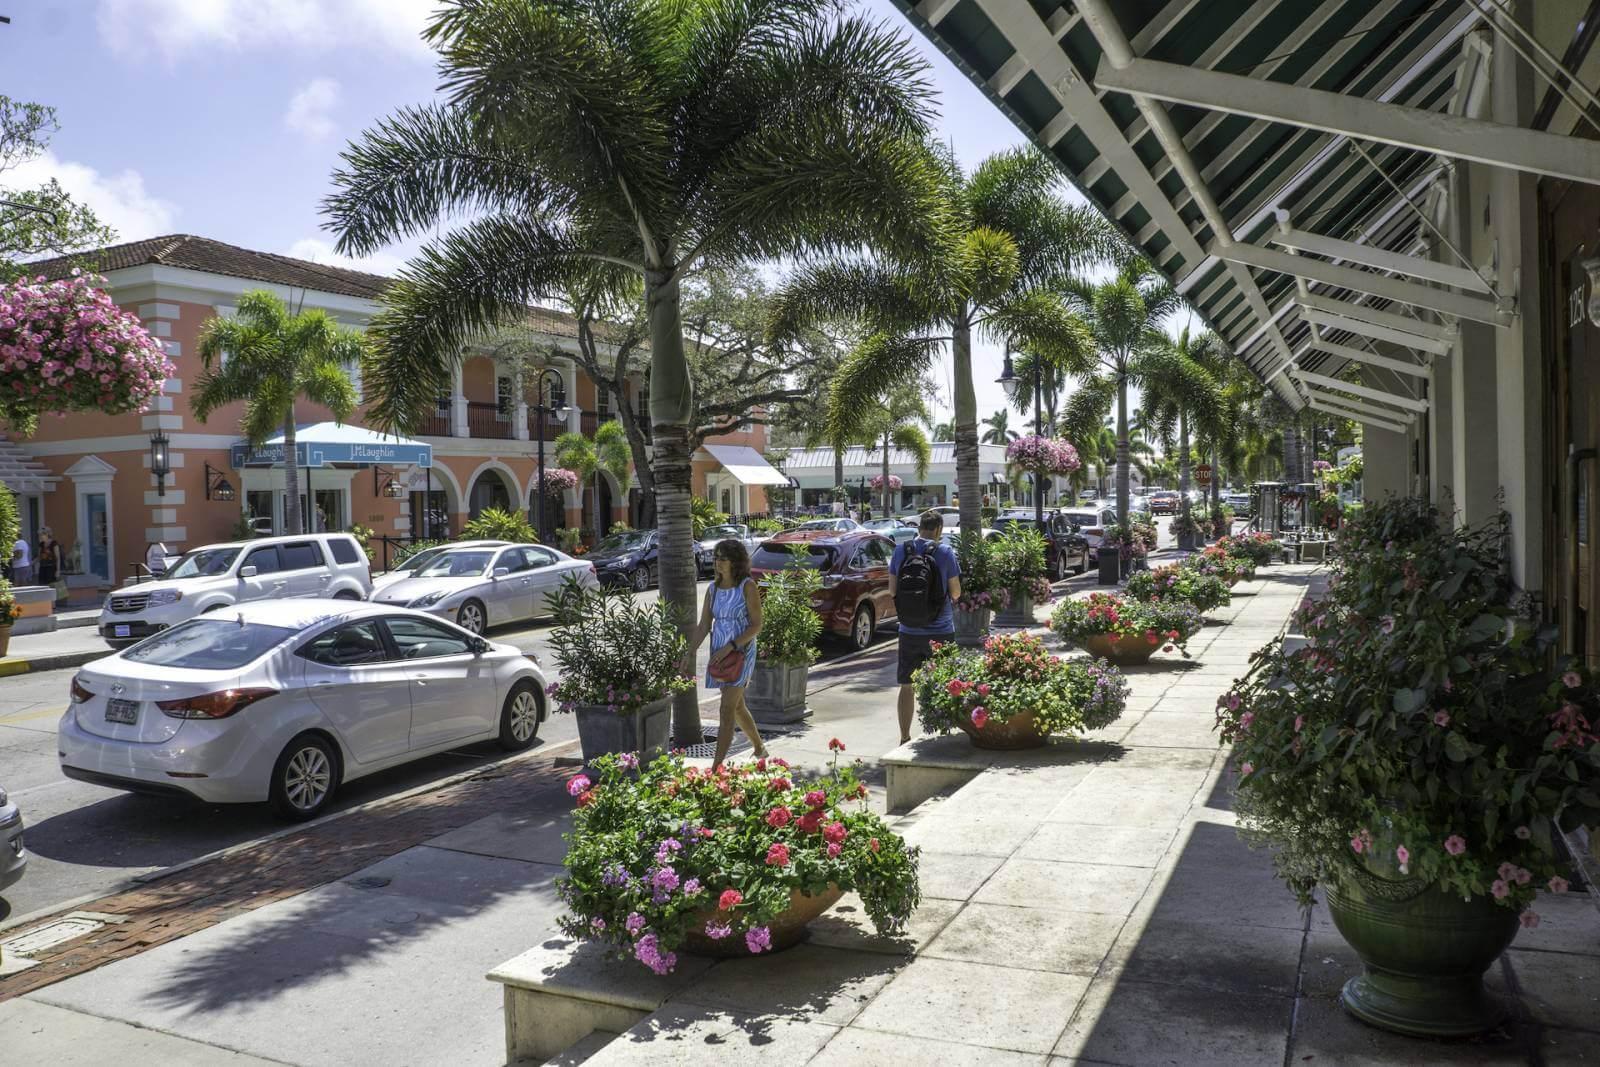 Third Street South shopping Naples, Florida. Photo by Jennifer Brinkman.